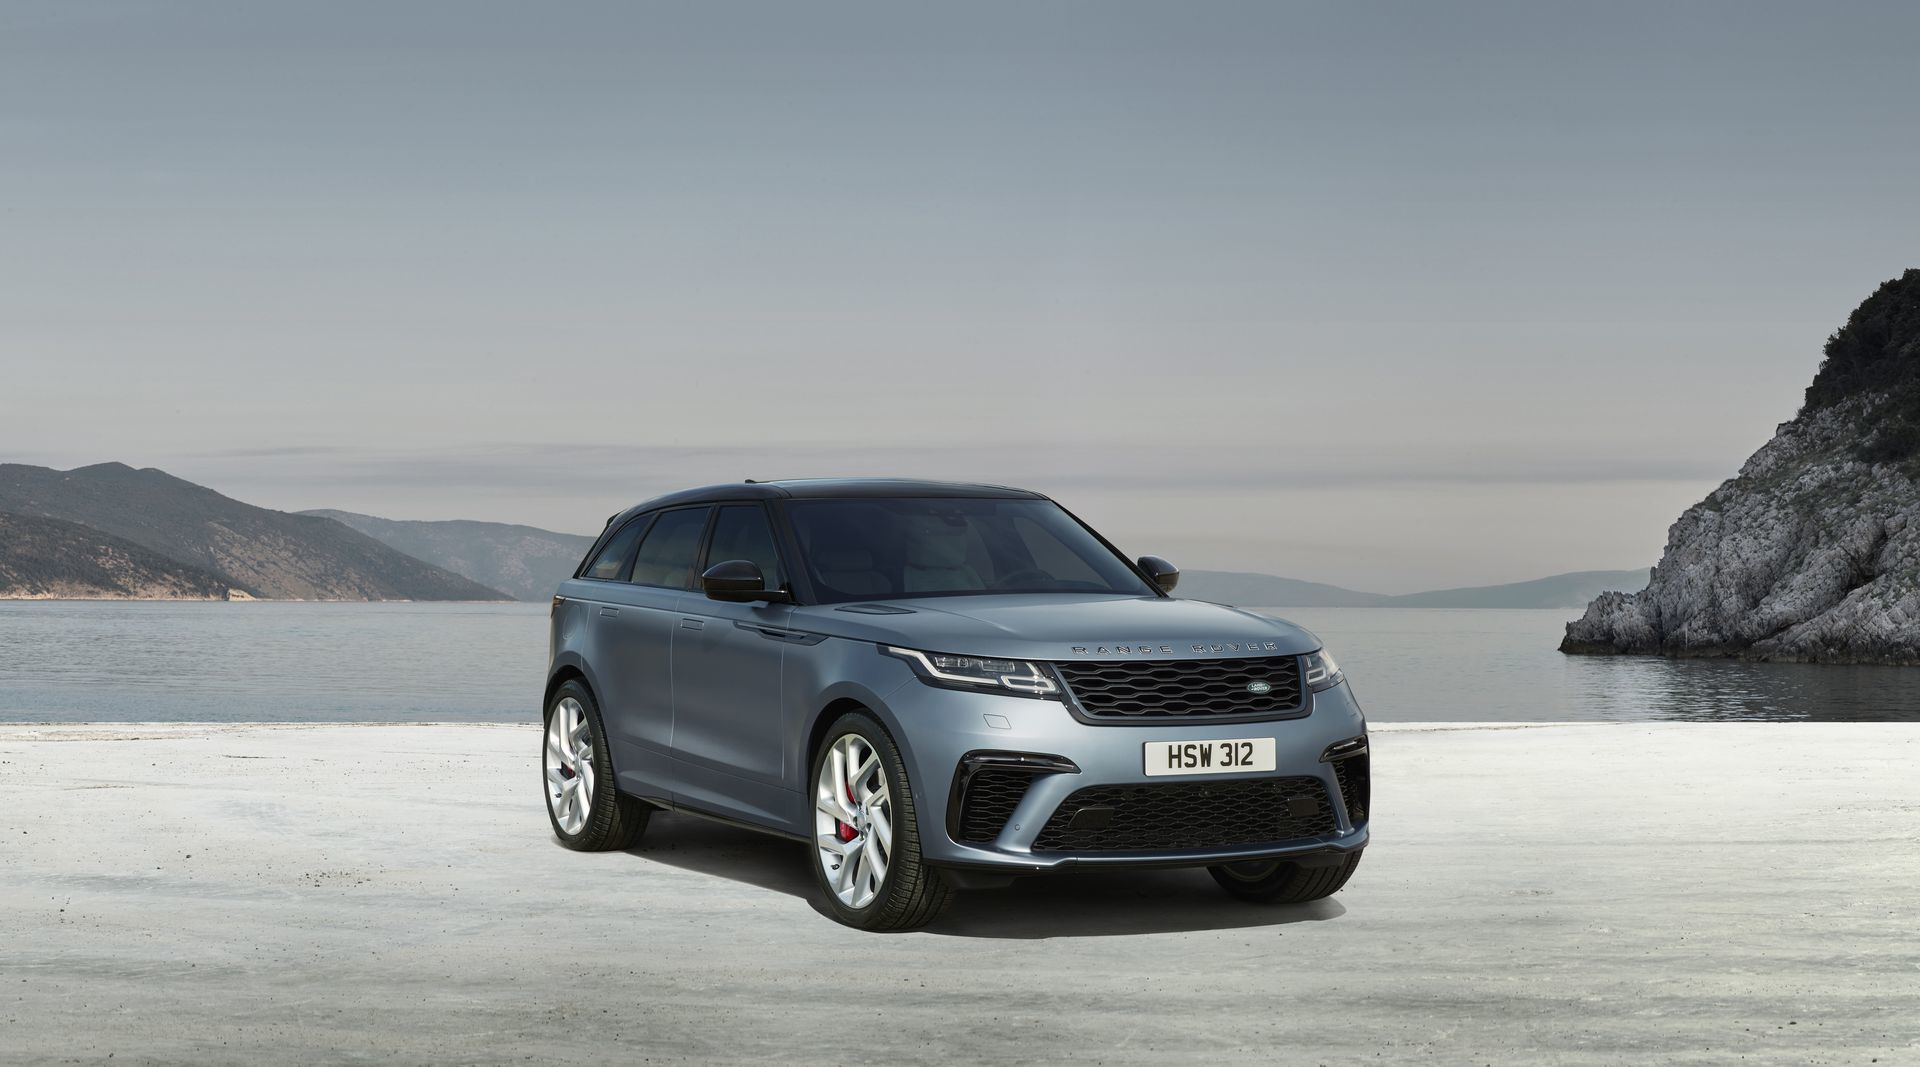 Range Rover Velar Svautobiography 24